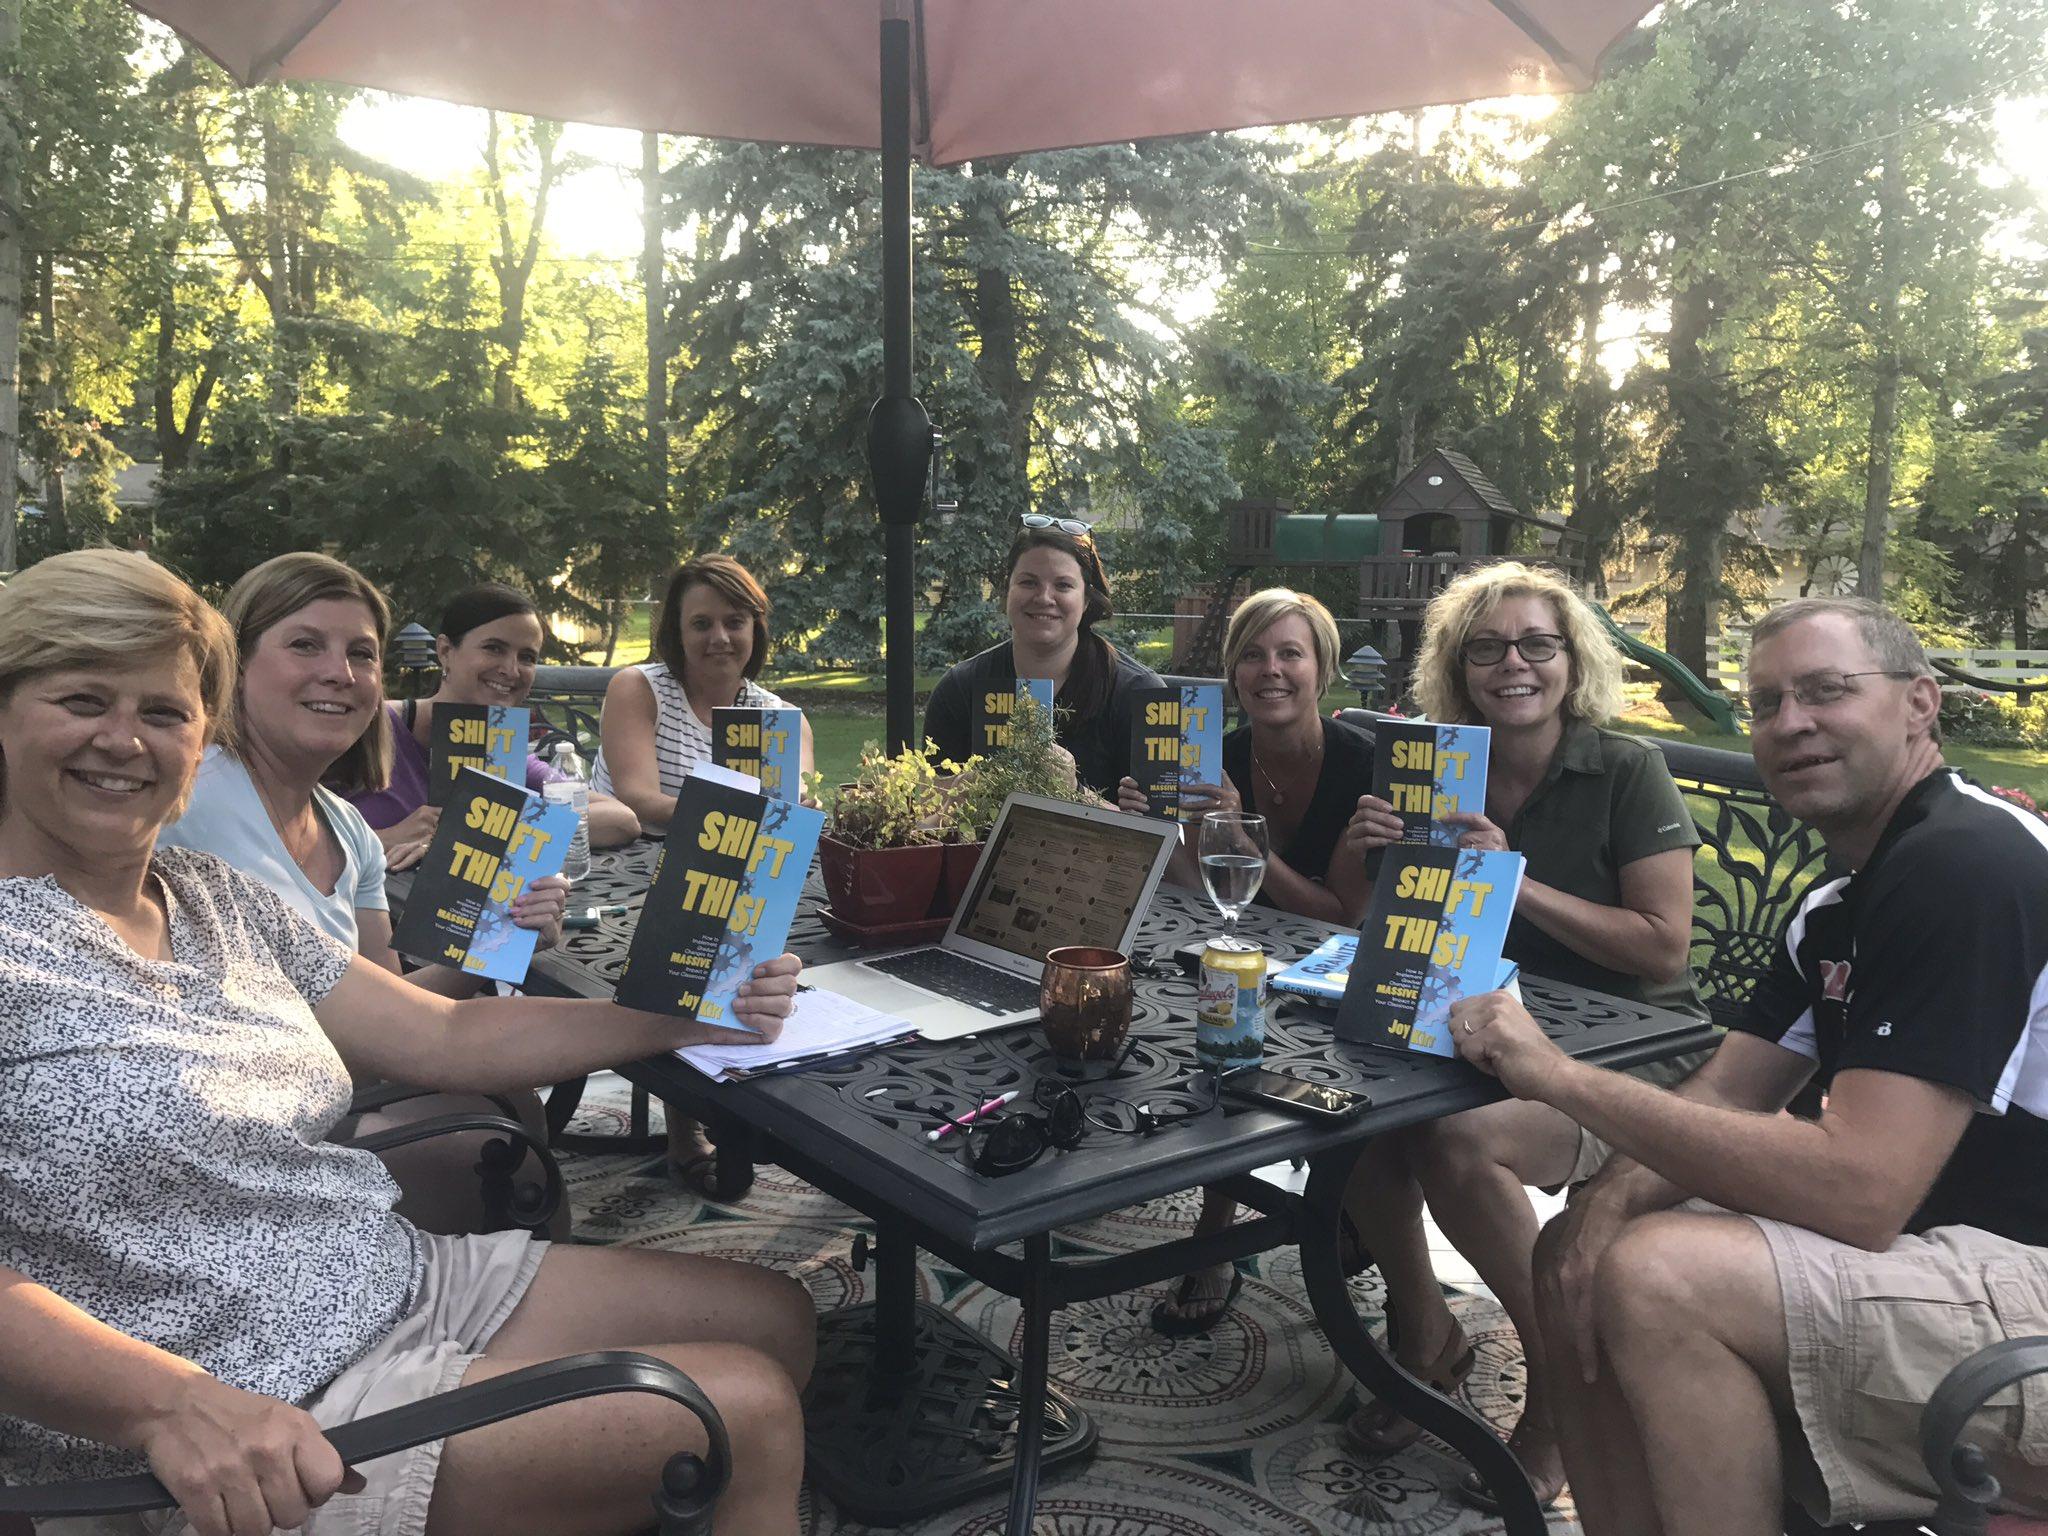 We're having a great discussion tonight on @mgaukler deck with @JoyKirr book #ShiftThis #gfedchat #SummerFun #JoyfulLeaders https://t.co/wShk4haP14